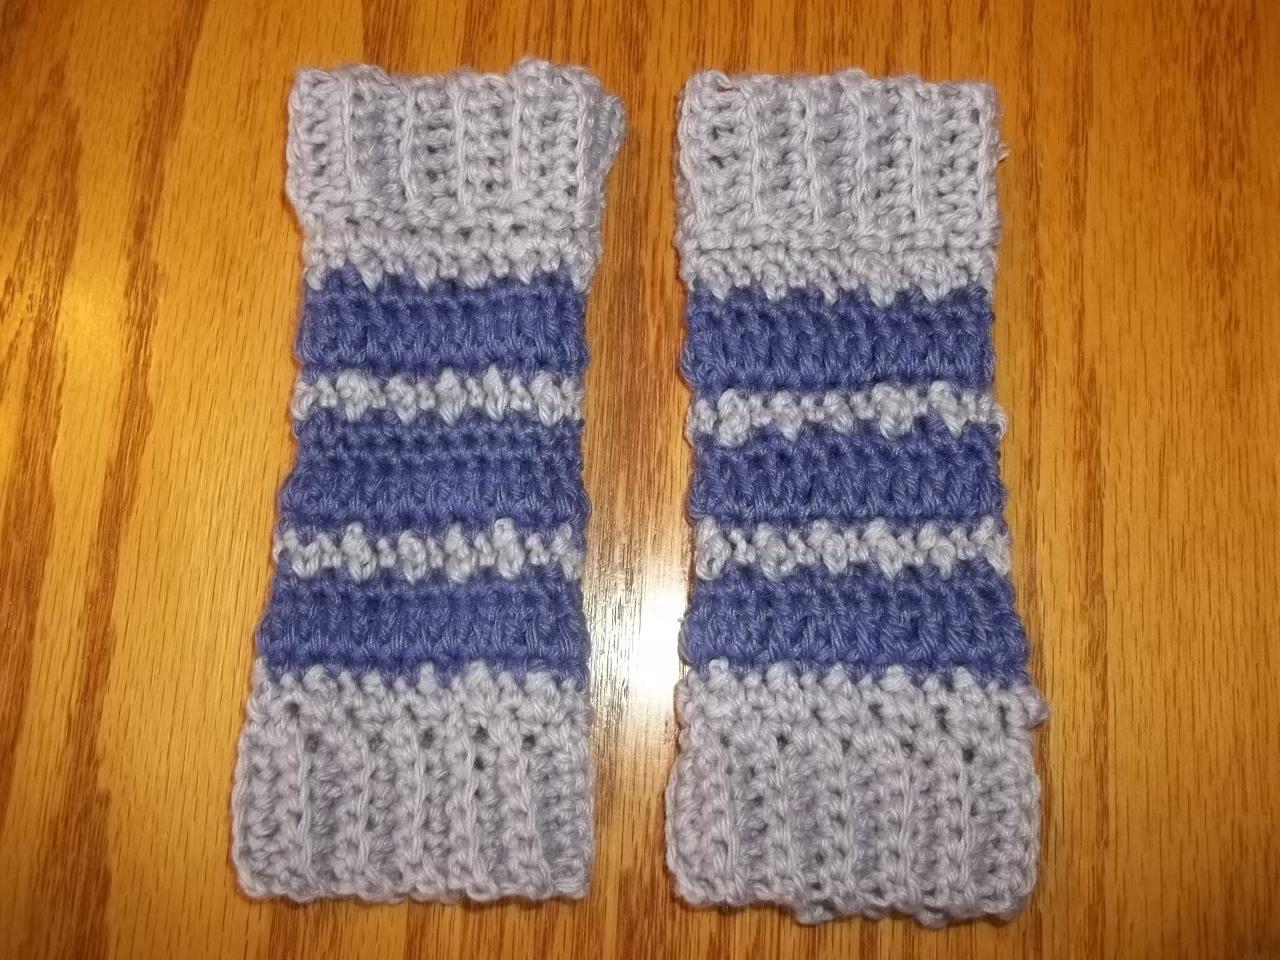 bead stitch baby legwarmers test for Rhelena